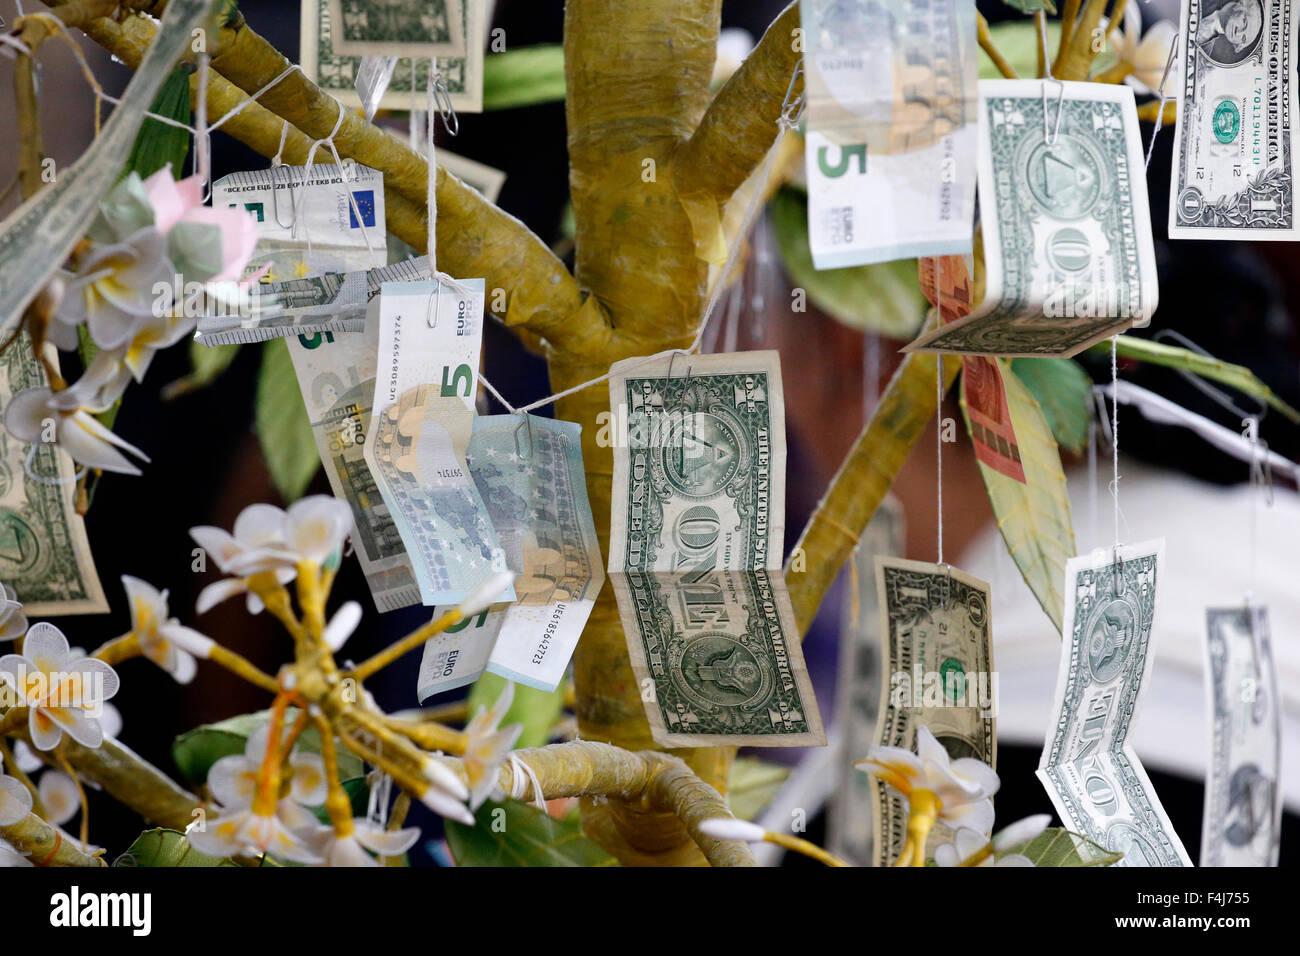 Buddhist money tree to make merit and donate to local temple, Wat Velouvanaram, Bussy Saint Georges, Seine et Marne, - Stock Image